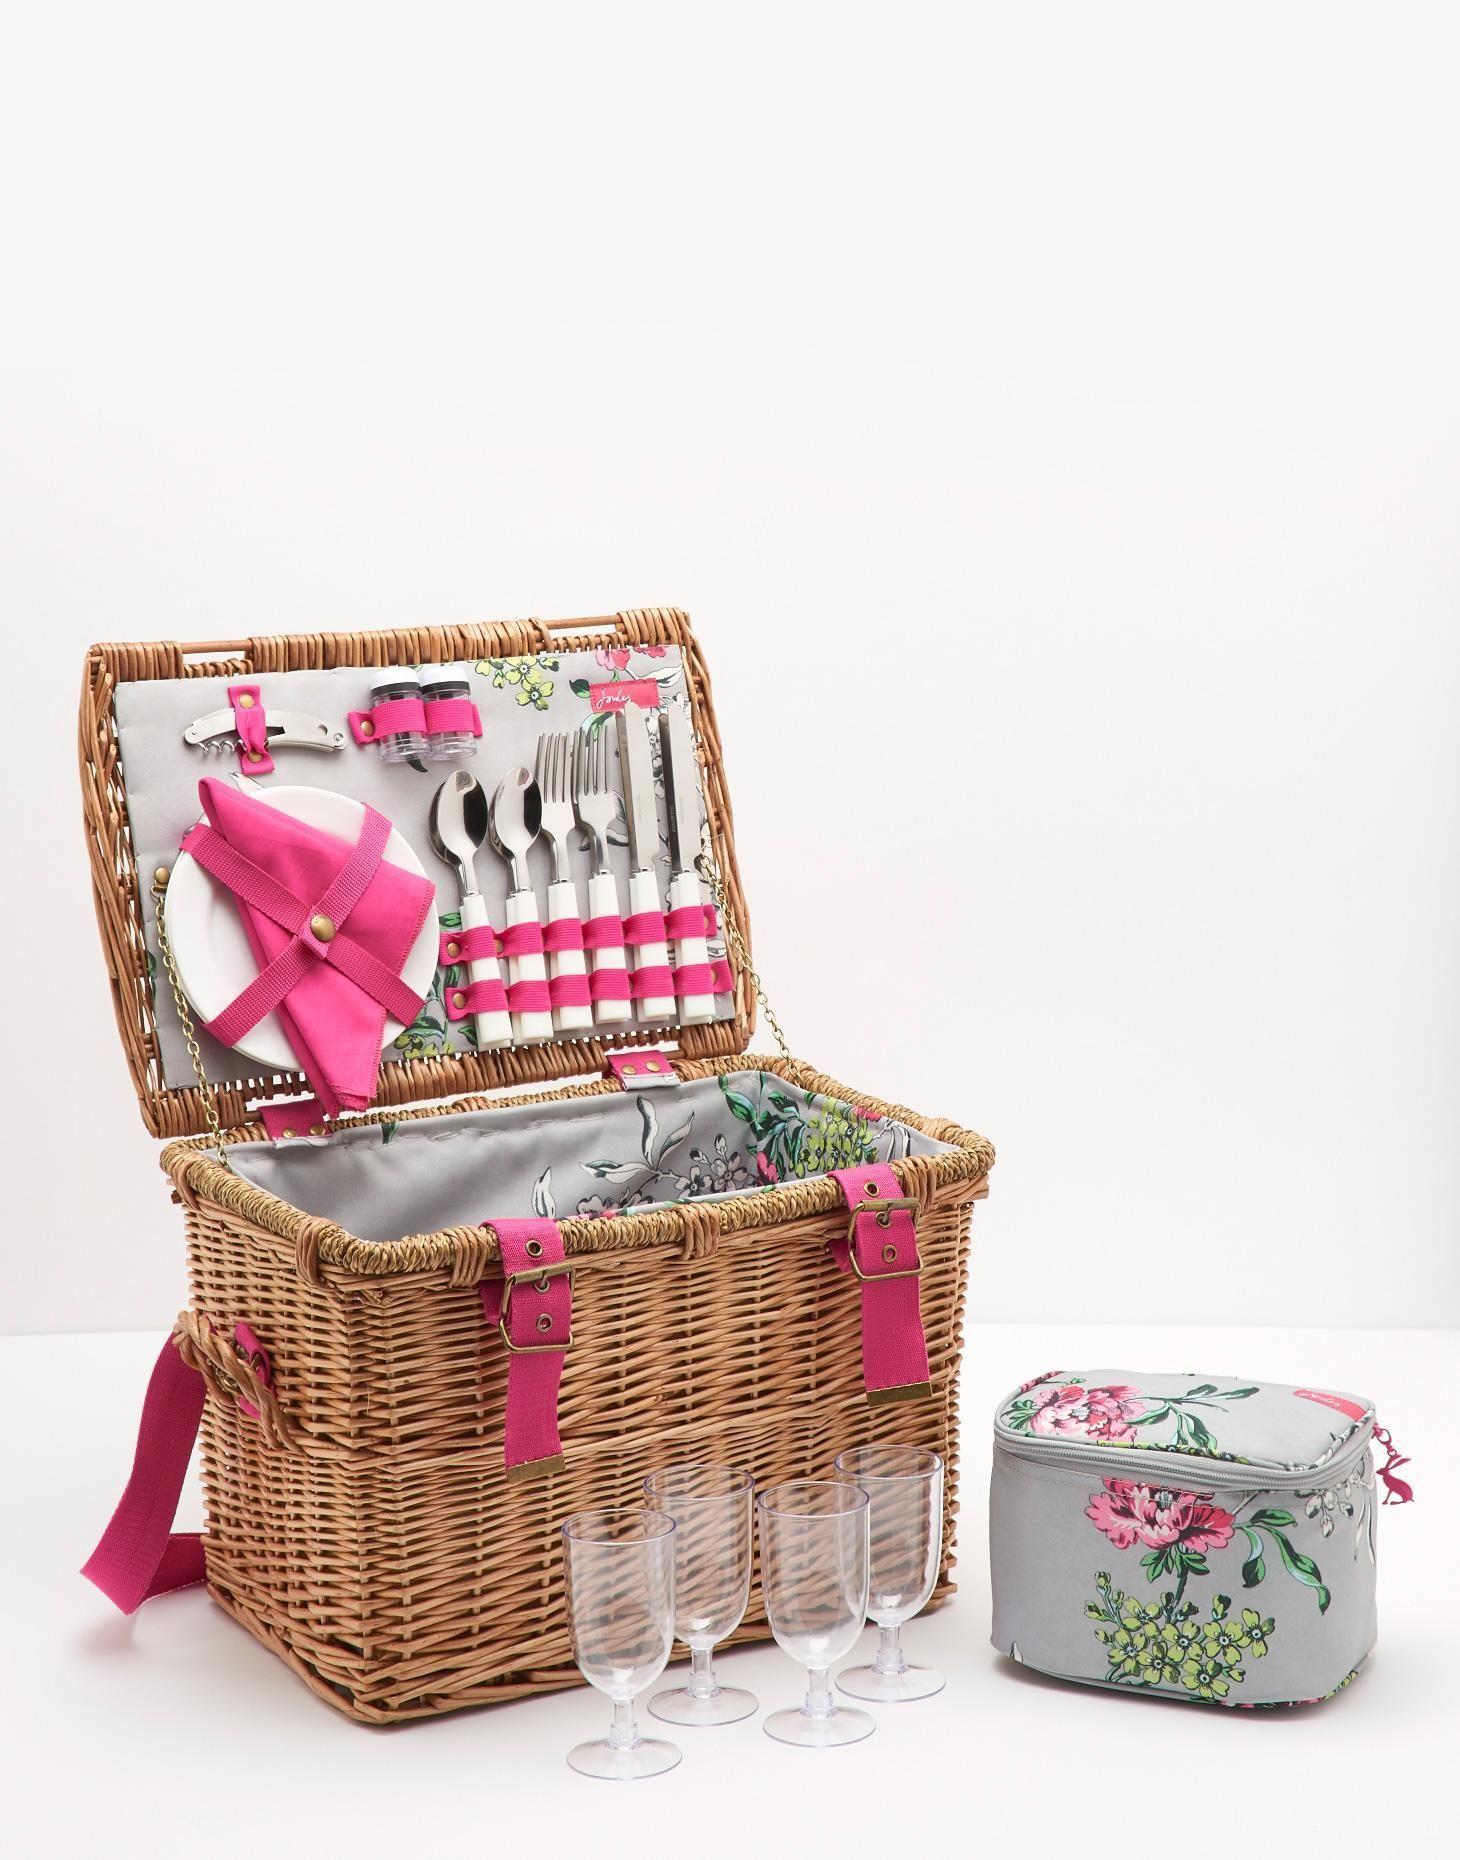 Picnic Grey Floral Basket   Comida   Pinterest   Picnics and Foods